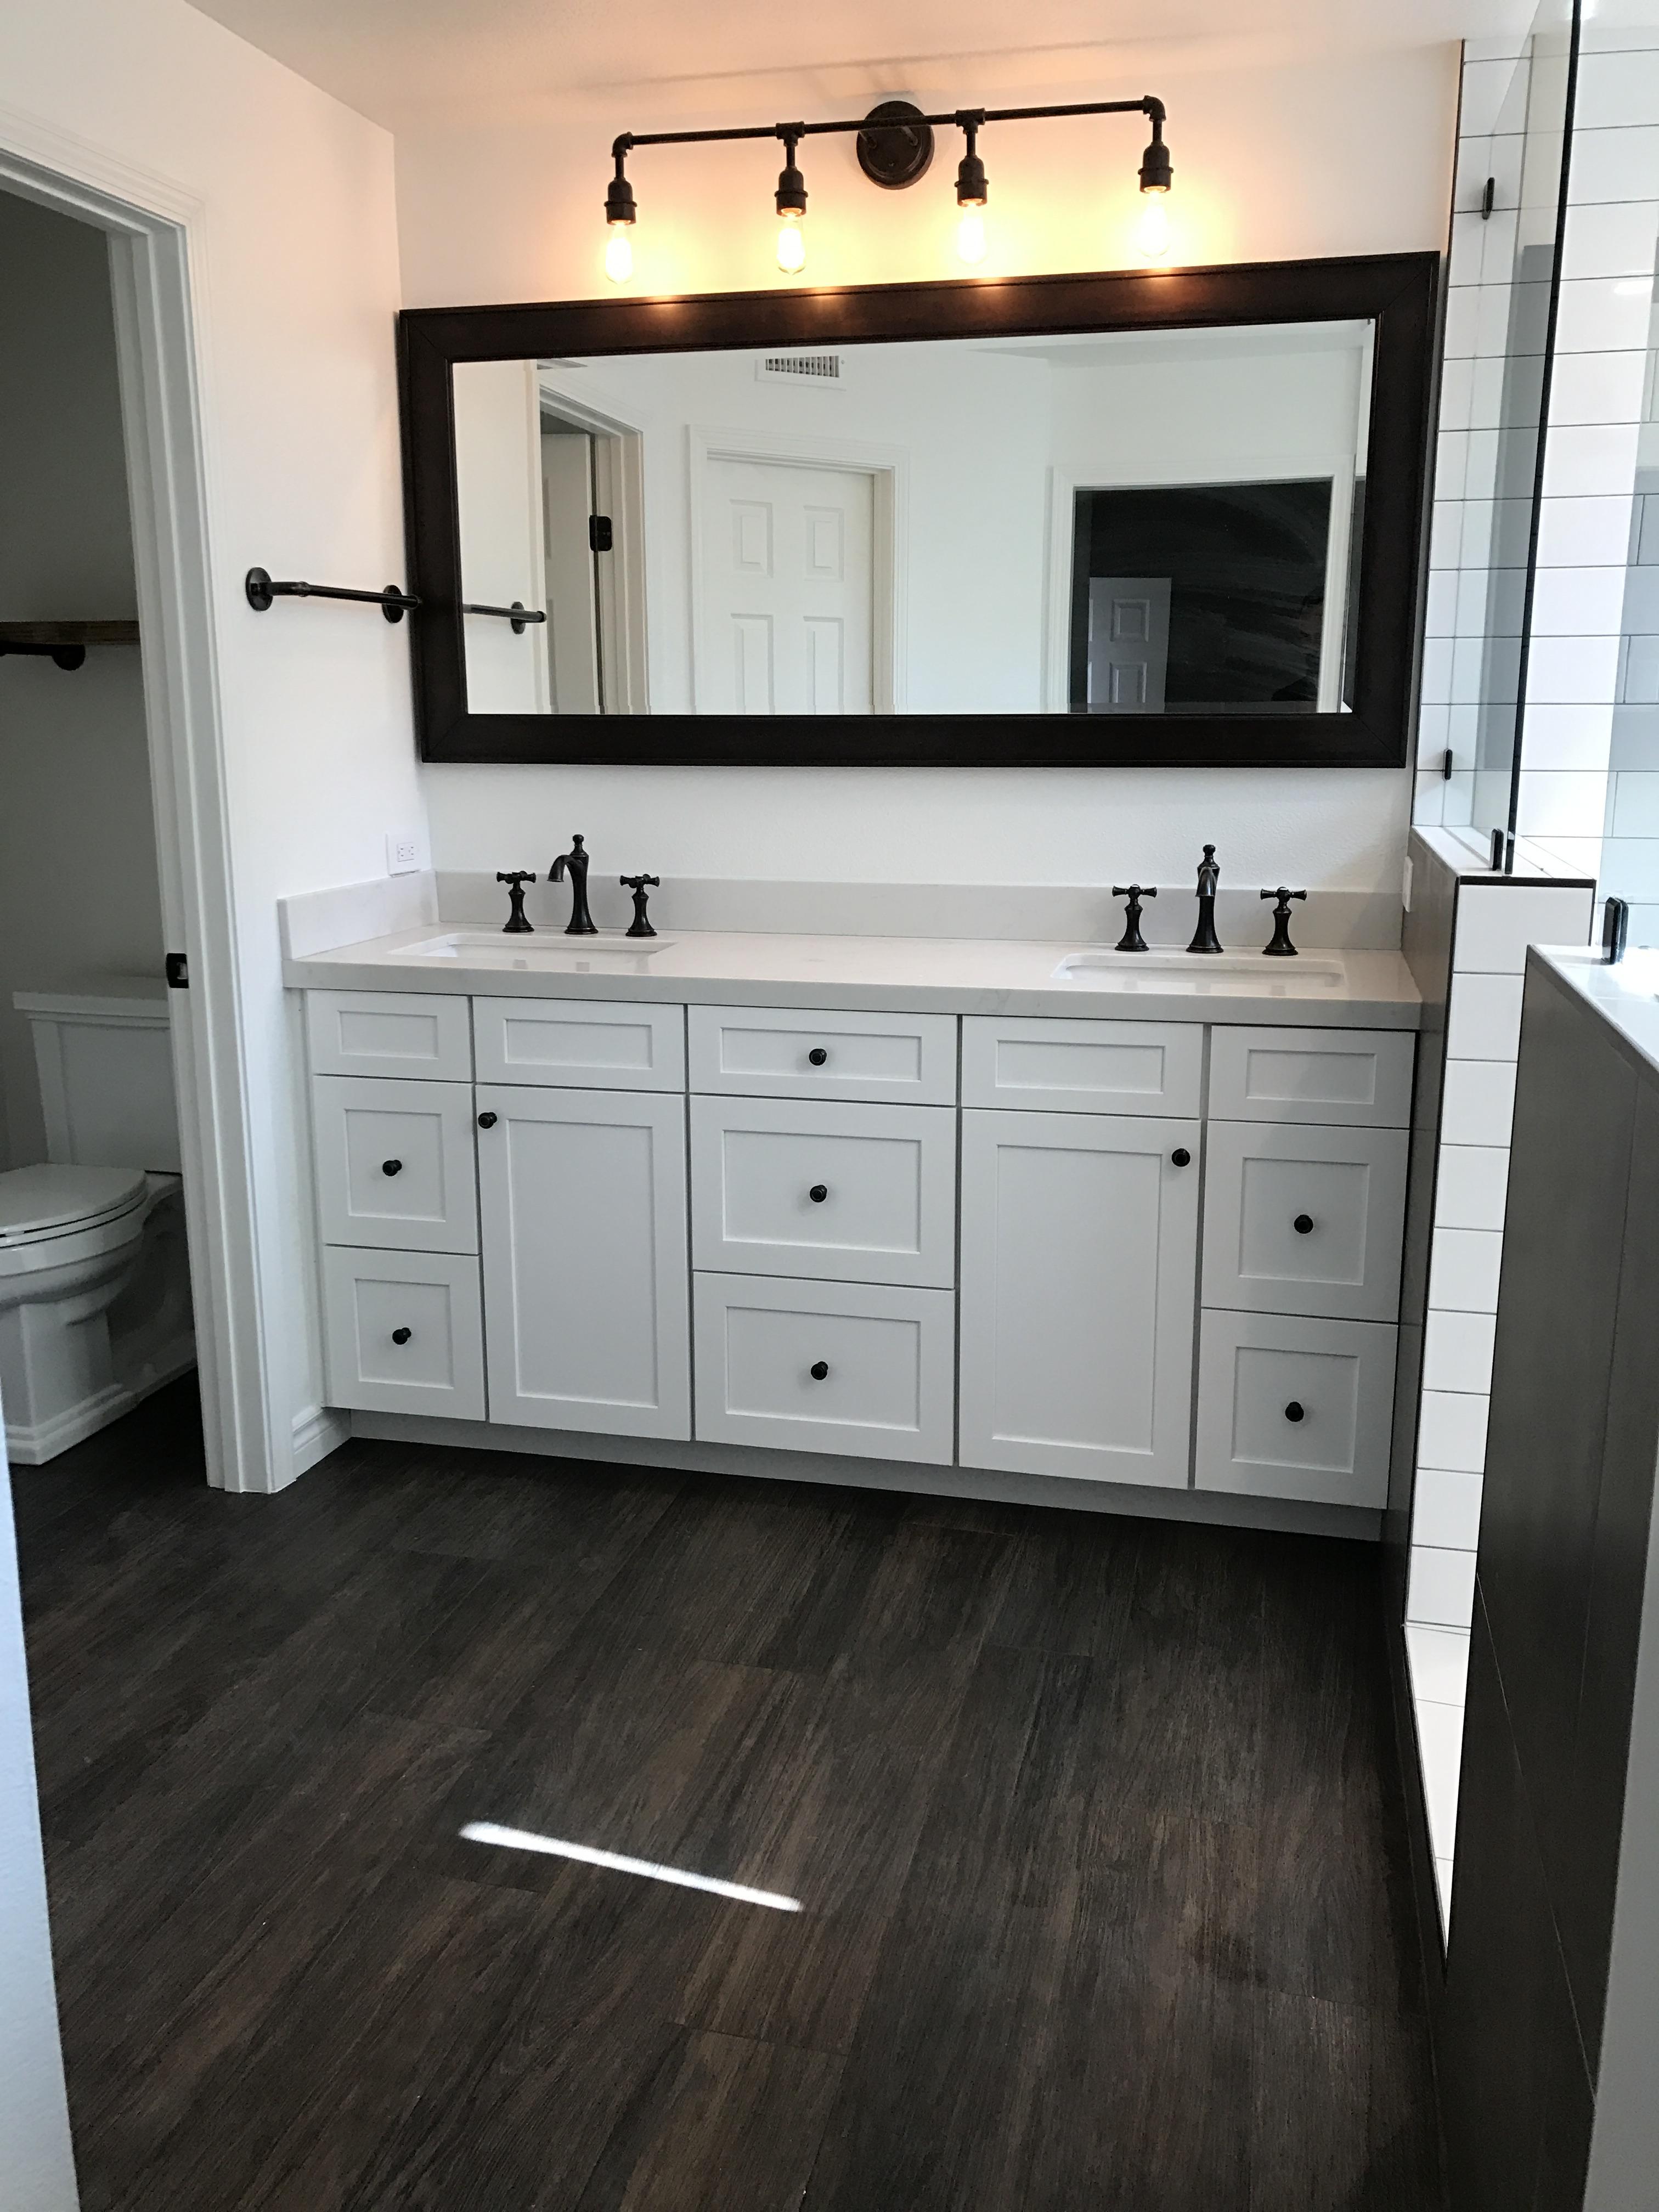 Orange County Bathroom Remodels - Inspired Remodels